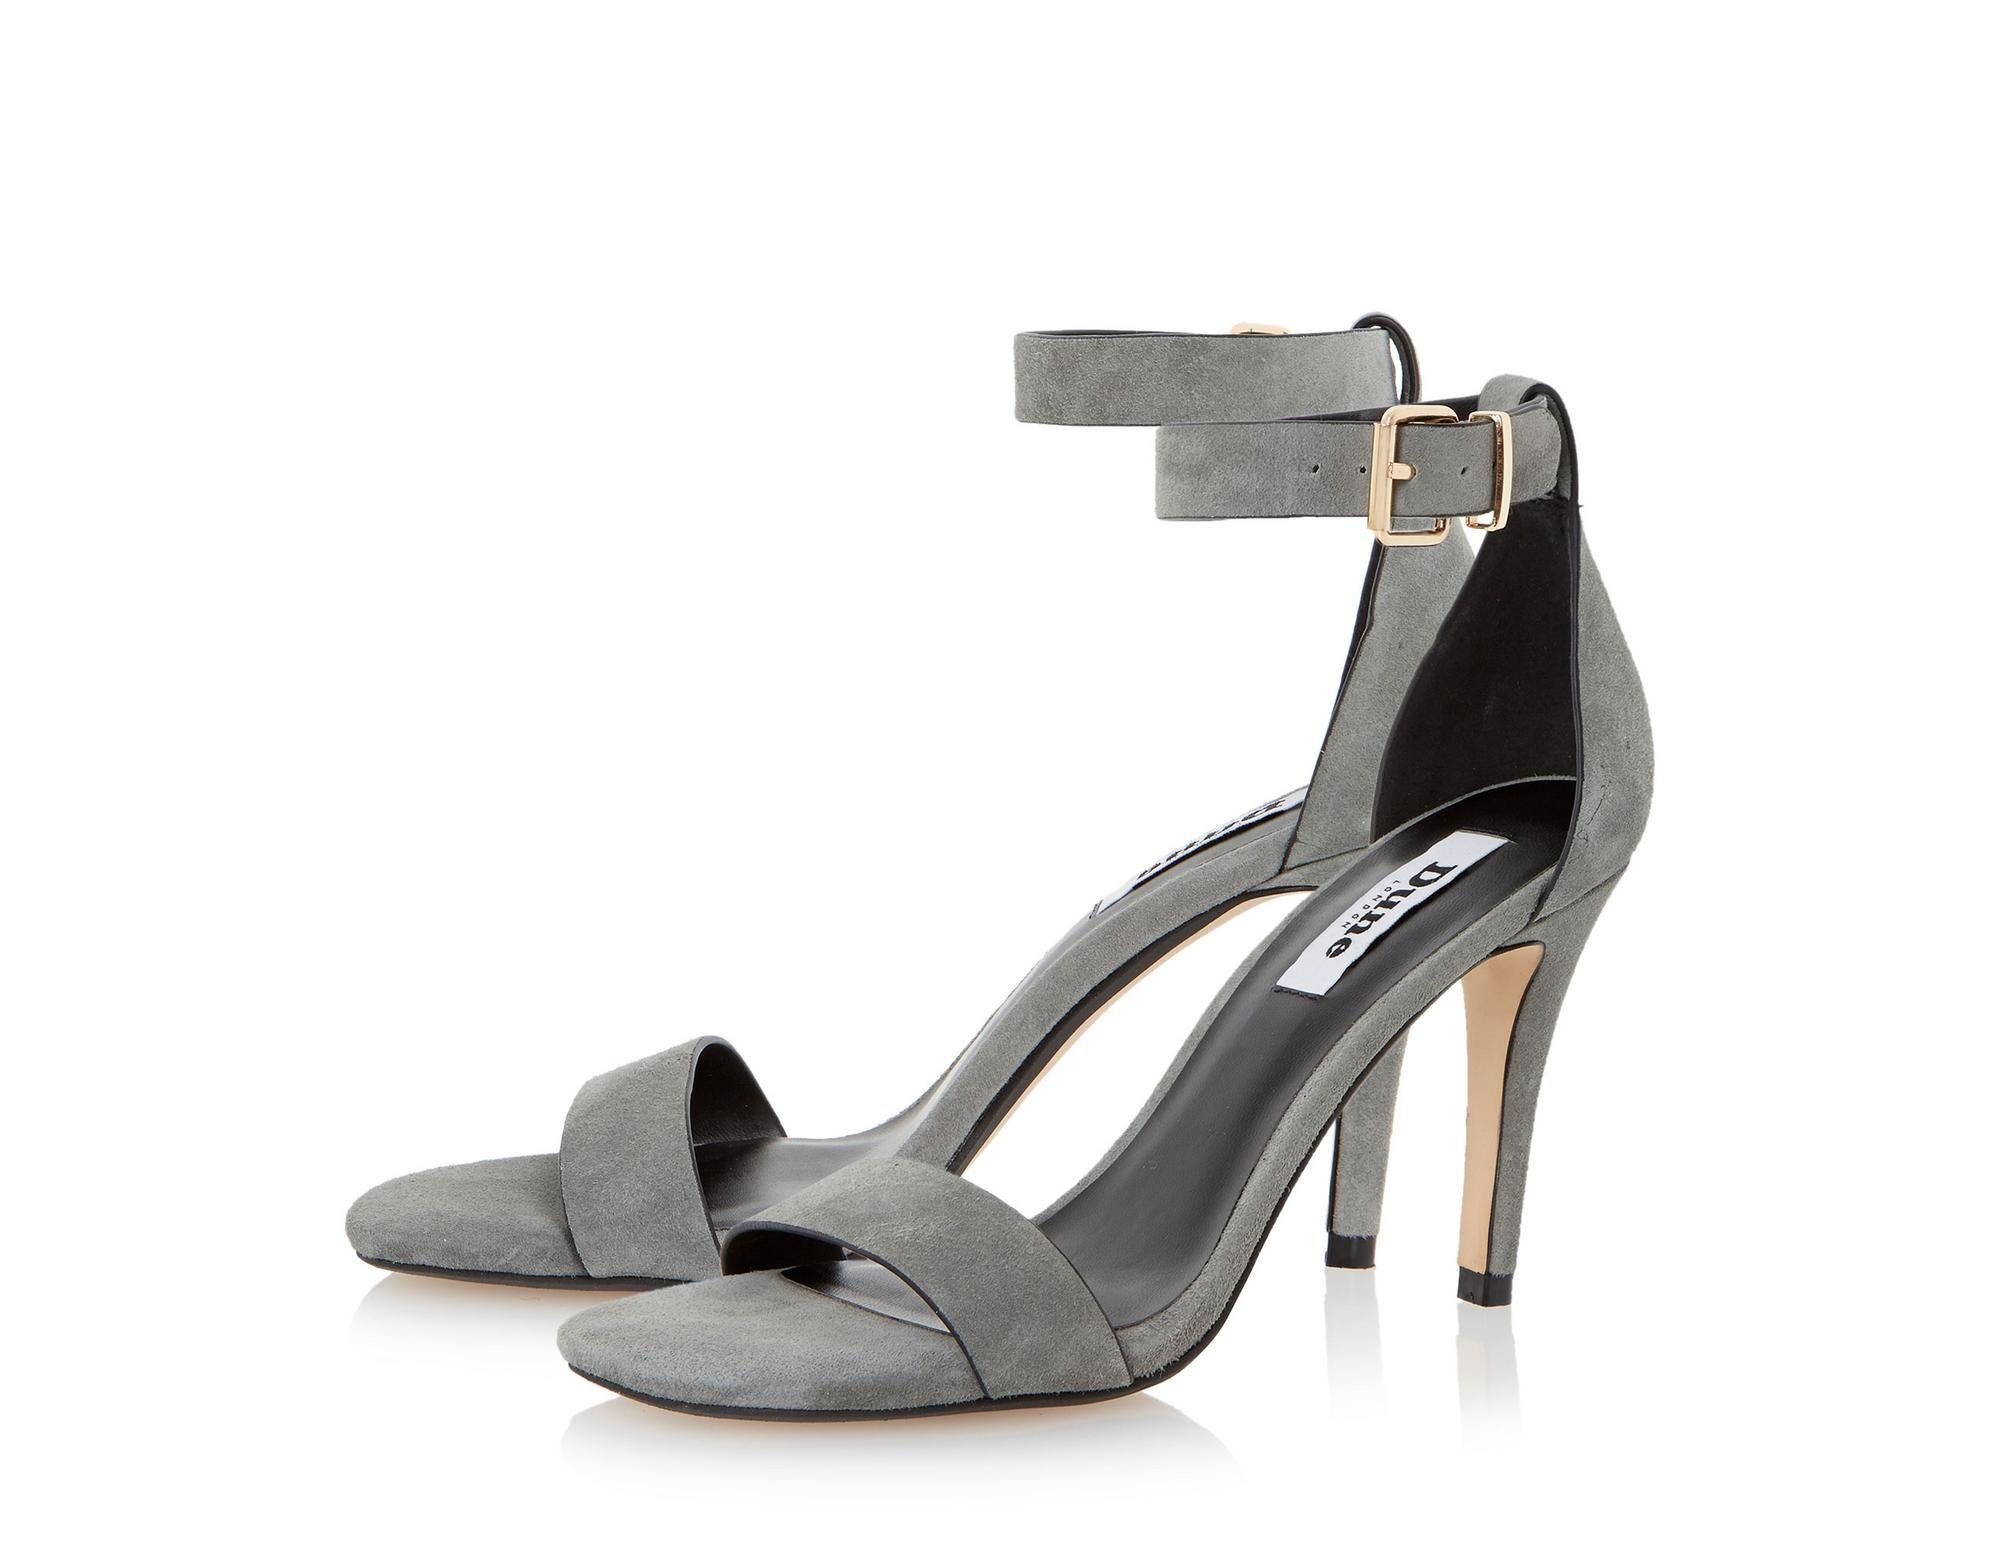 DUNE LADIES MARA - Suede Square Toe Two Part High Heel Sandal - grey | Dune